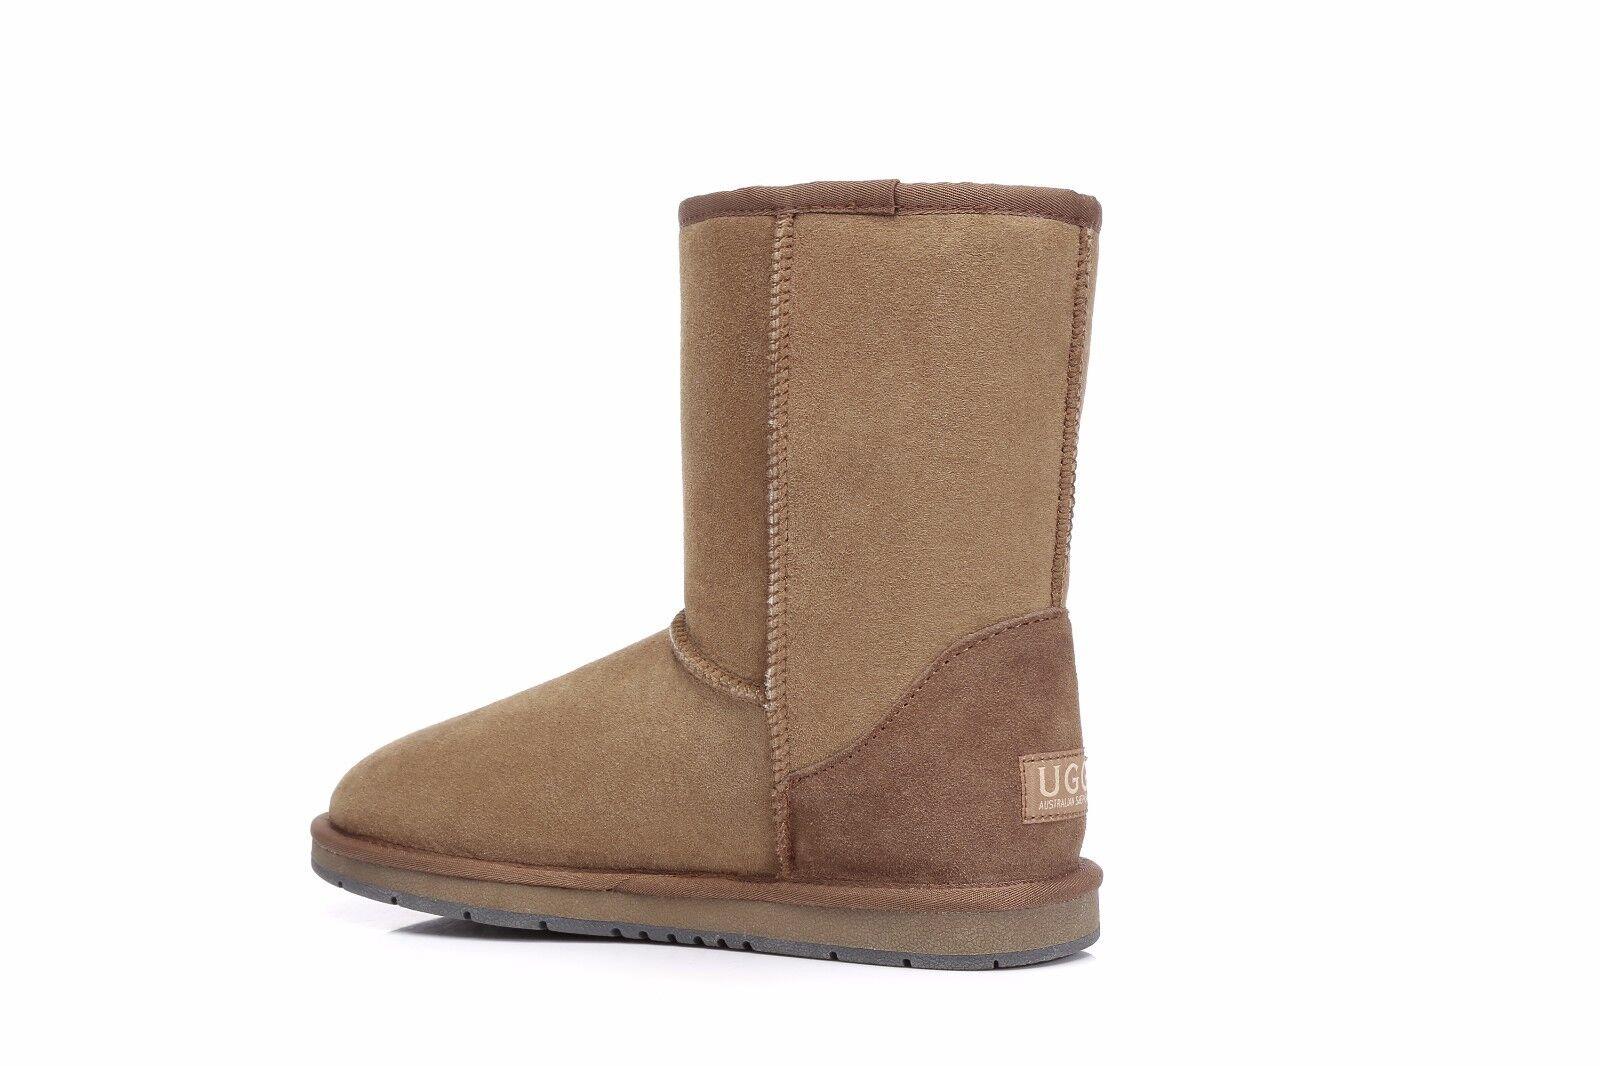 3f9713aa52a UGG Boots Short Classic Chestnut - Australian Sheepskin, Water ...